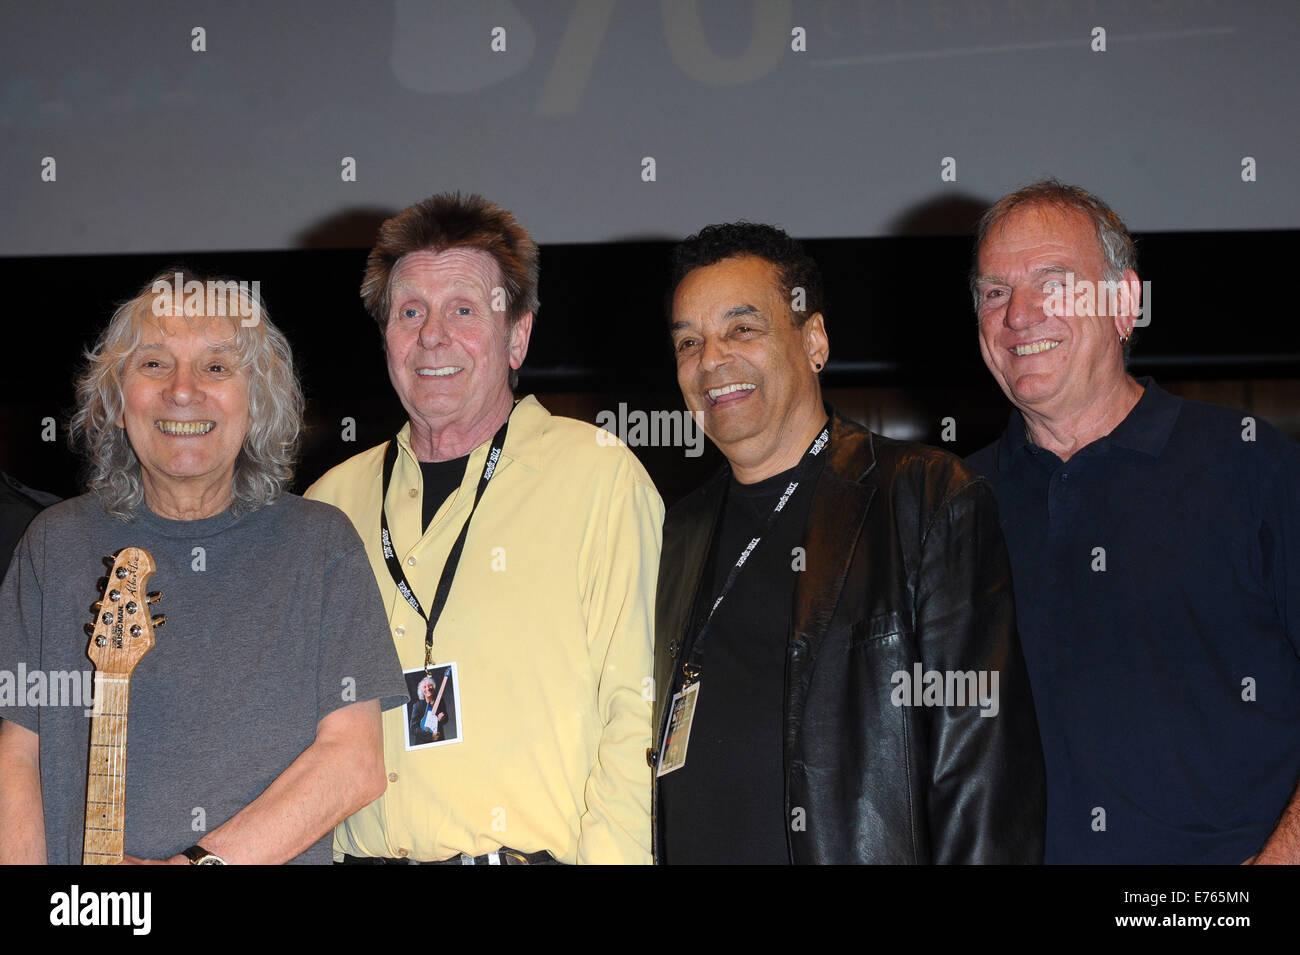 Albert Lee's 70th Anniversary Concert held at Cadogan Hall - Inside  Featuring: Albert Lee,Joe Brown,Gary US - Stock Image